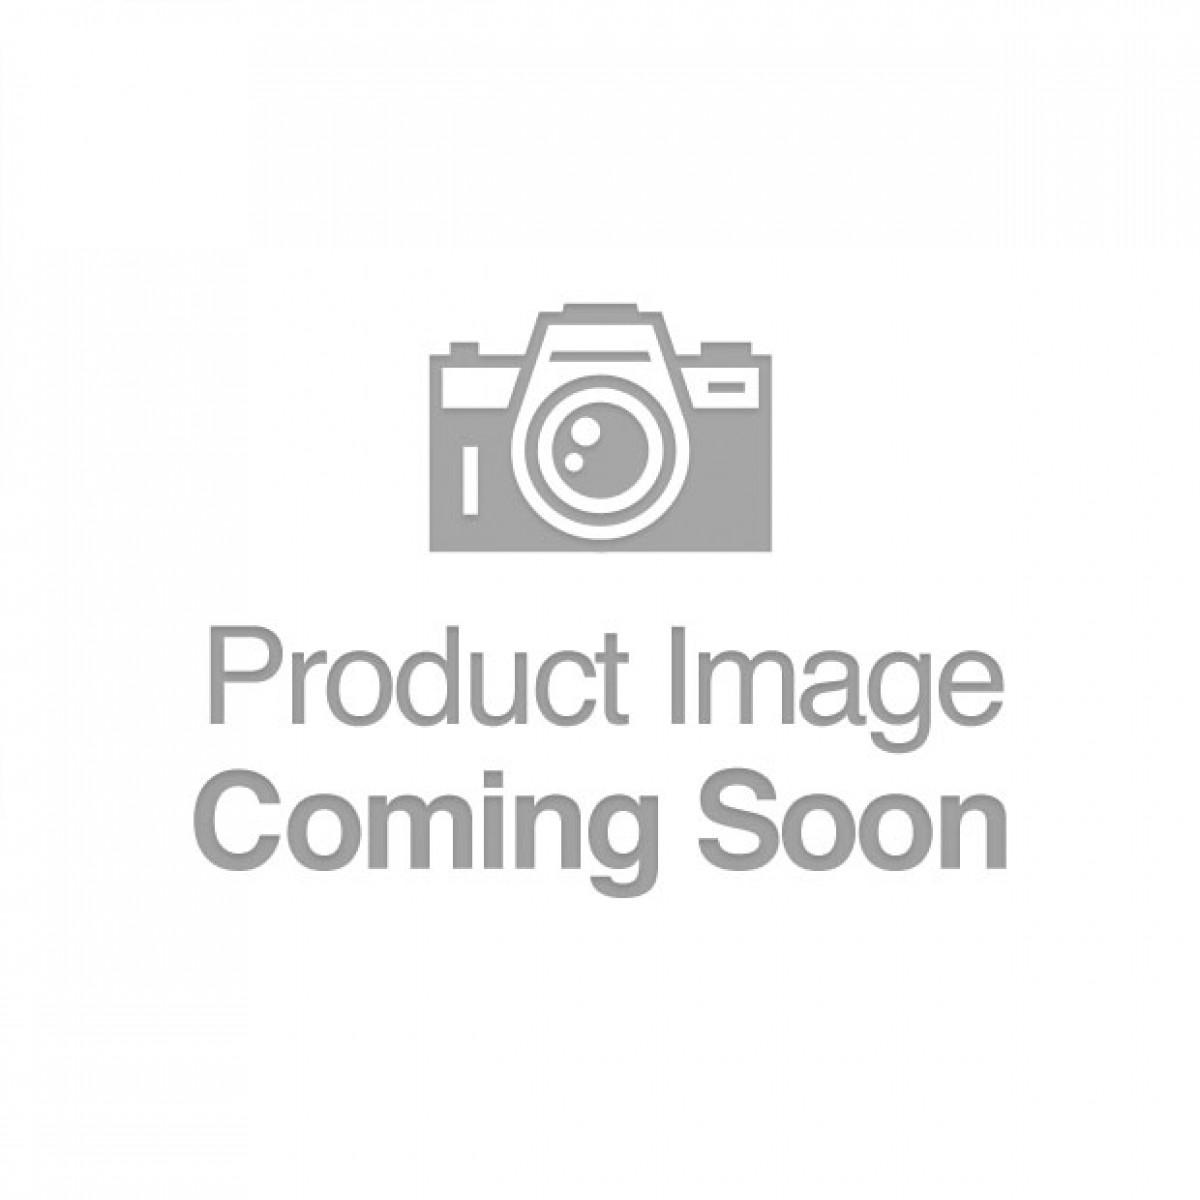 Blush Performance Stroker Pump Sleeve - Clear